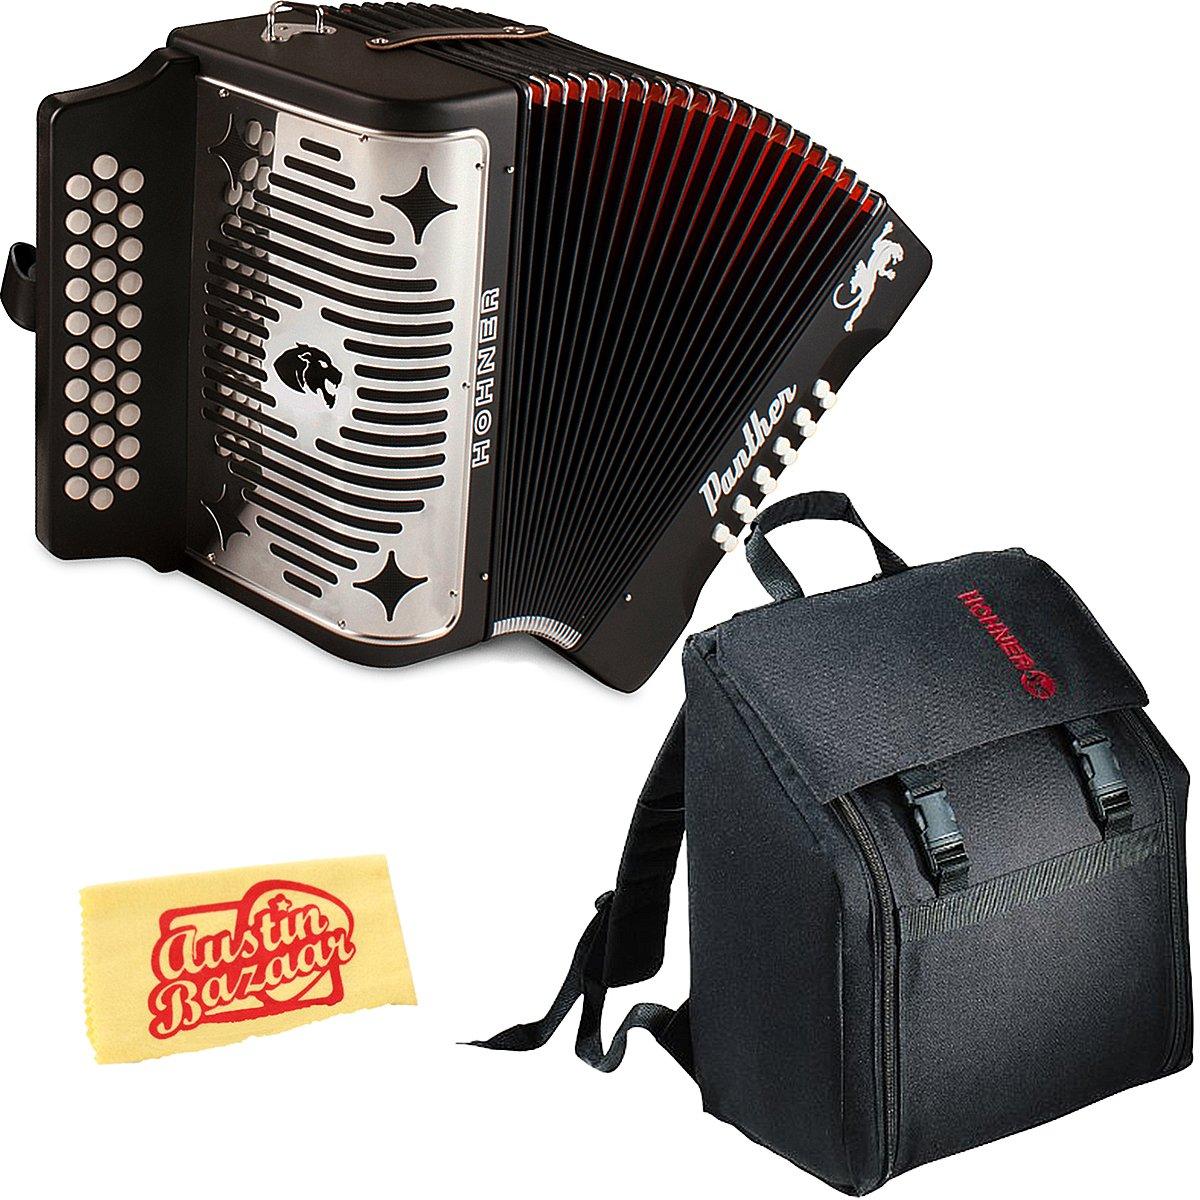 Hohner Panther Diatonic Accordion - Keys F/Bb/Eb Bundle with Gig Bag and Austin Bazaar Polishing Cloth by Hohner